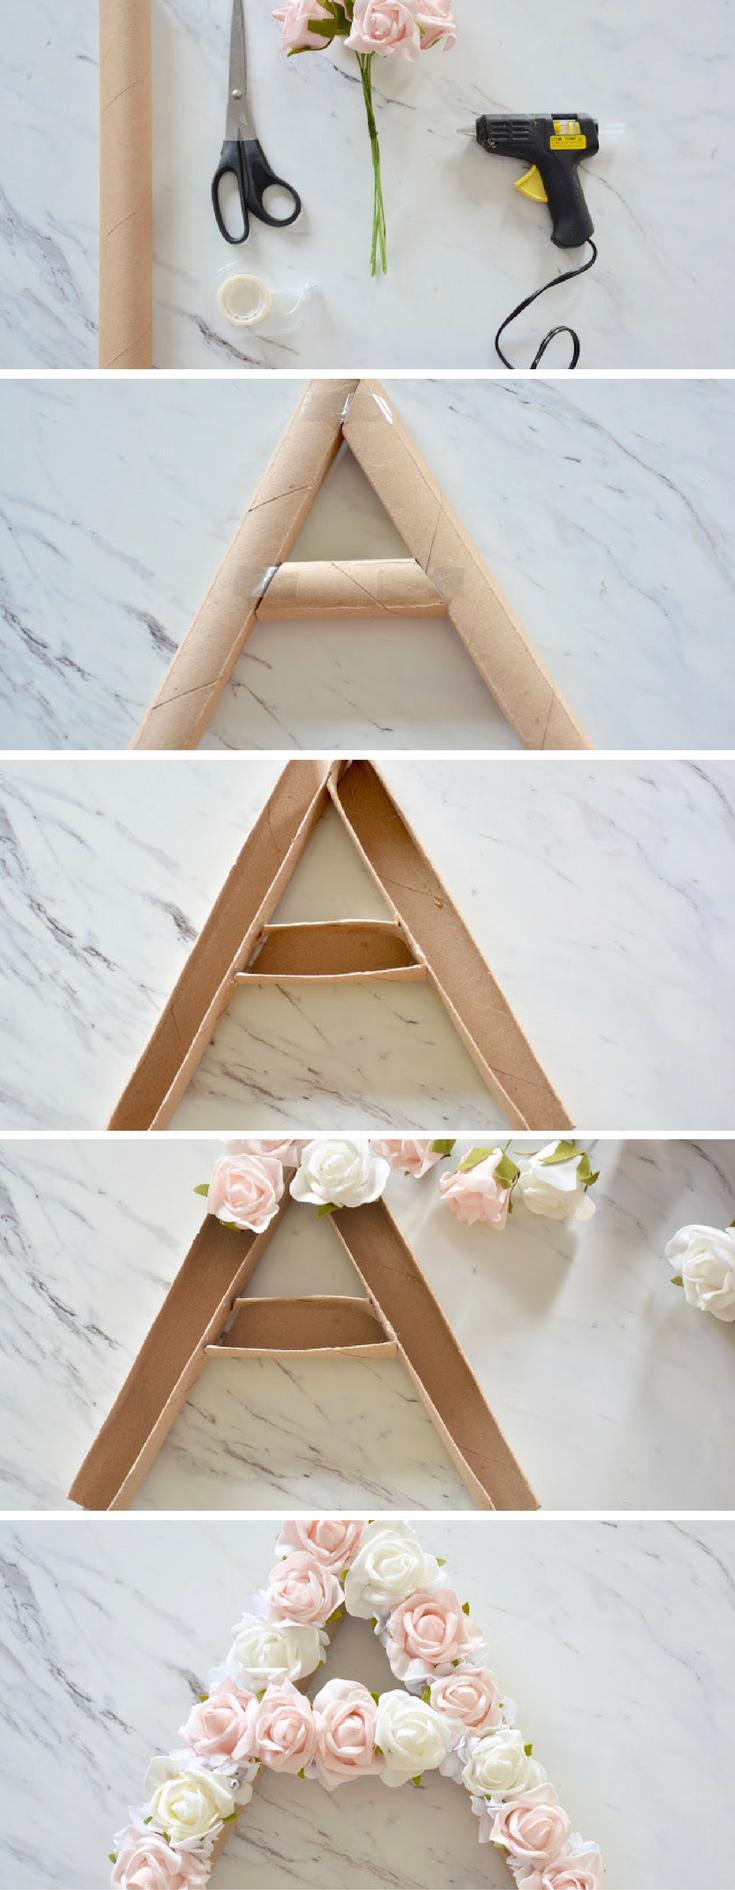 Ideas : DIY Flower Monogram - make this fun and easy summer decor! #DIYHomeDecorSummer